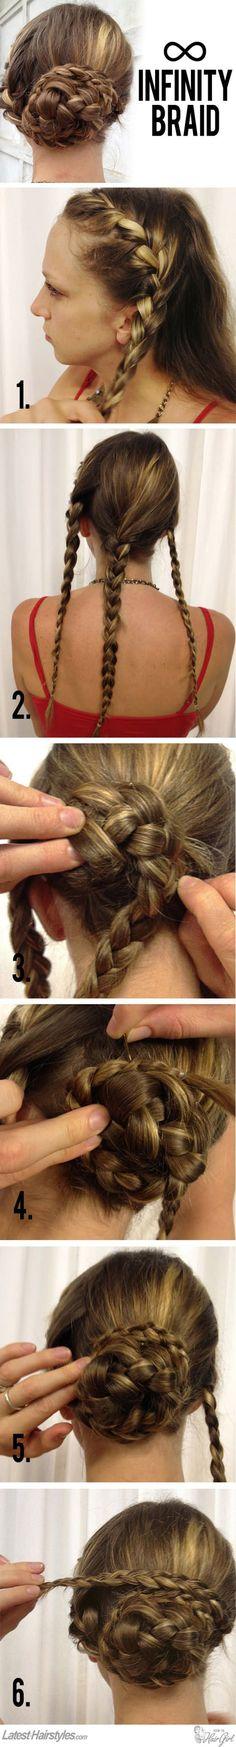 10 Beautiful DIY Hairstyles to Wear to a Wedding - #updo #braids